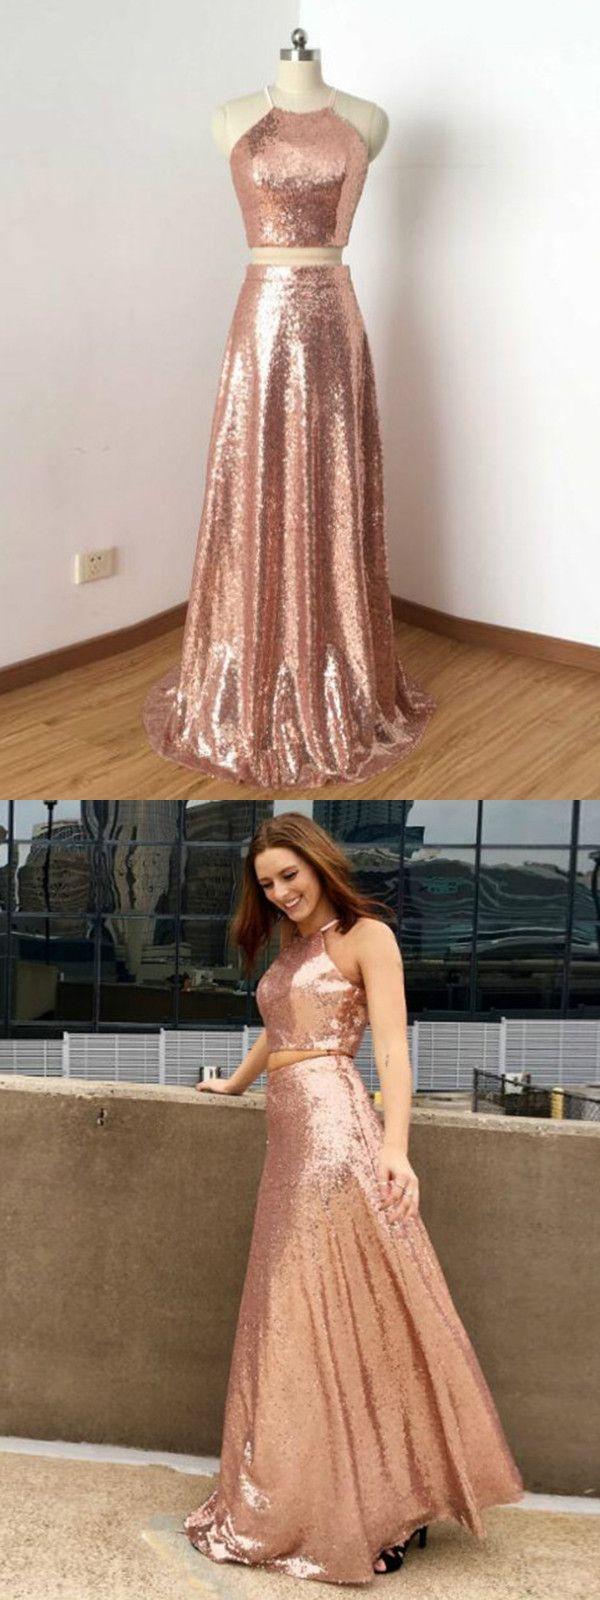 2018 Two Piece Prom Dress Lace Pink Cheap Long Prom Dress #VB2074